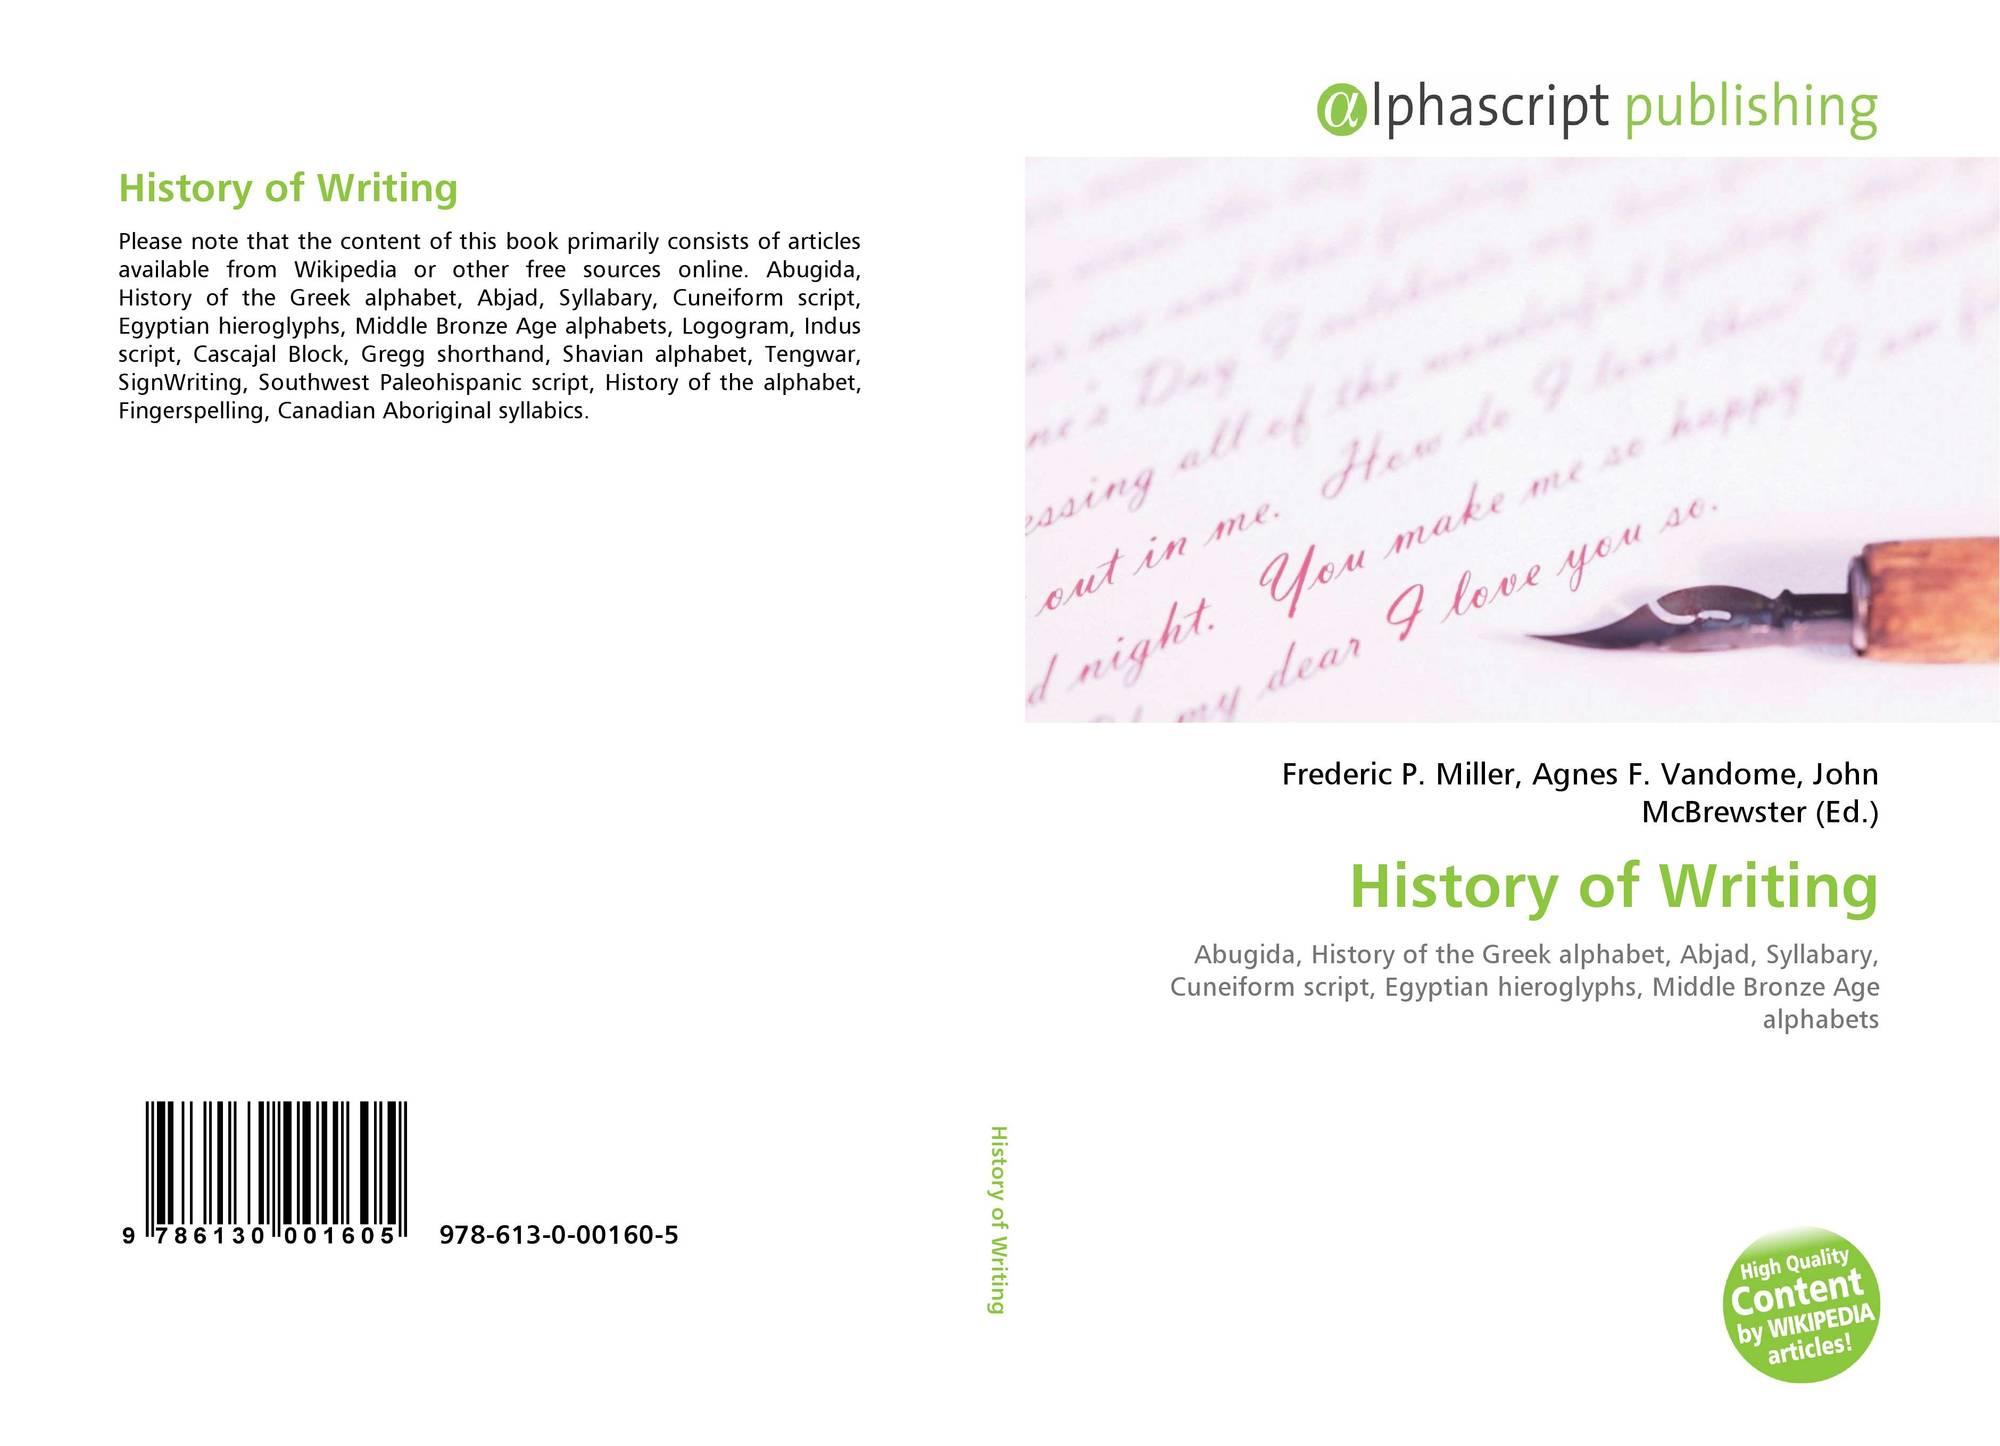 History of Writing, 978-613-0-00160-5, 6130001606 ,9786130001605